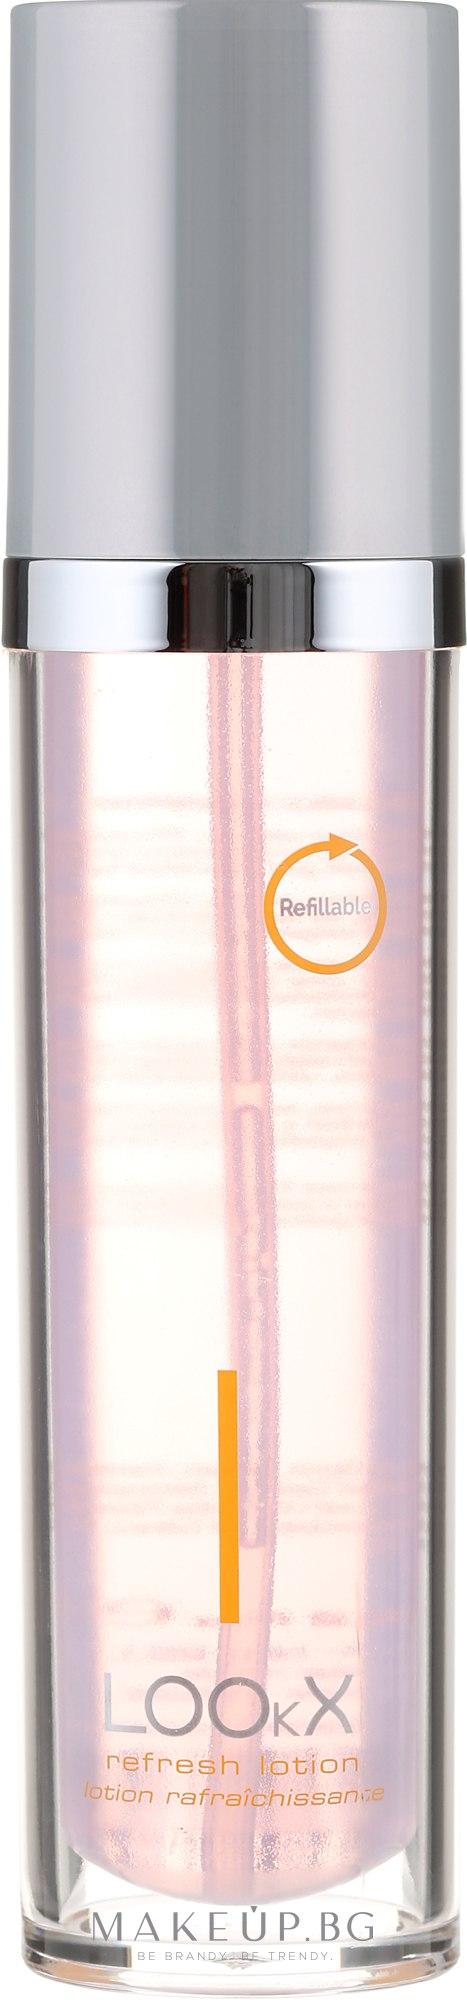 Почистващ лосион за лице - LOOkX Refresh Lotion — снимка 120 ml